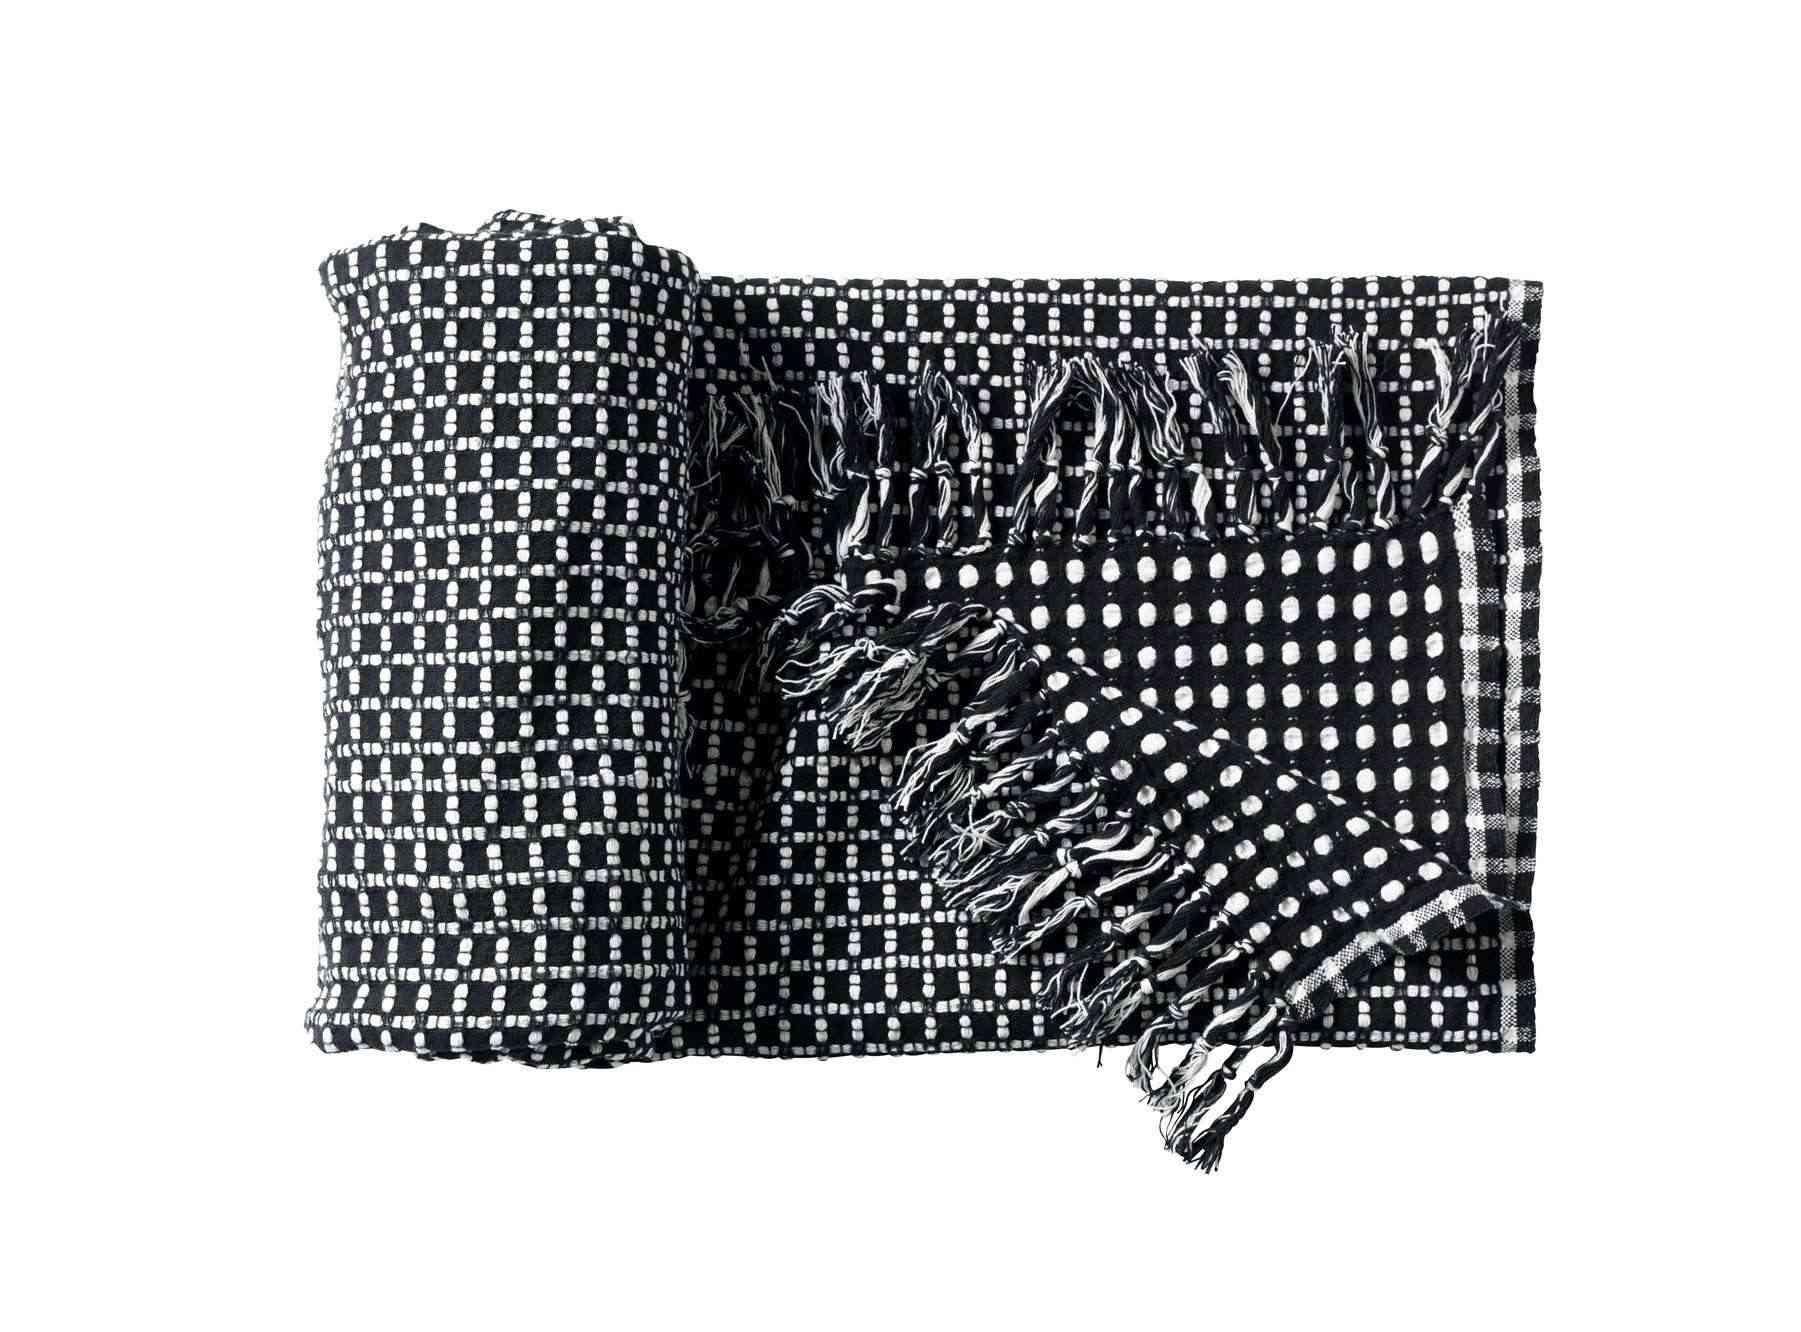 Sandra Werud Web 2010 4 textile txcl01a ColourCheck: NoInfo